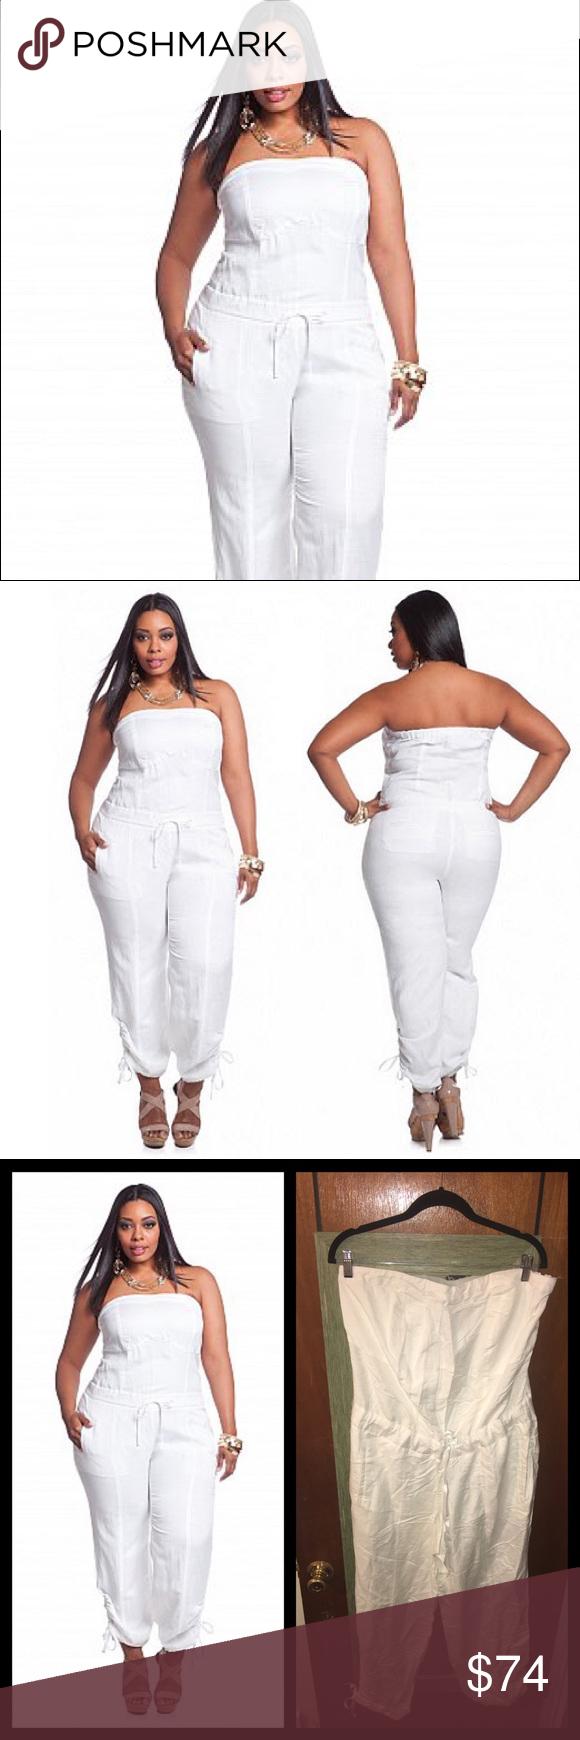 4d84e64ebd591 Ashley Stewart White Linen Jumpsuit White Drawstring Waist Jumpsuit